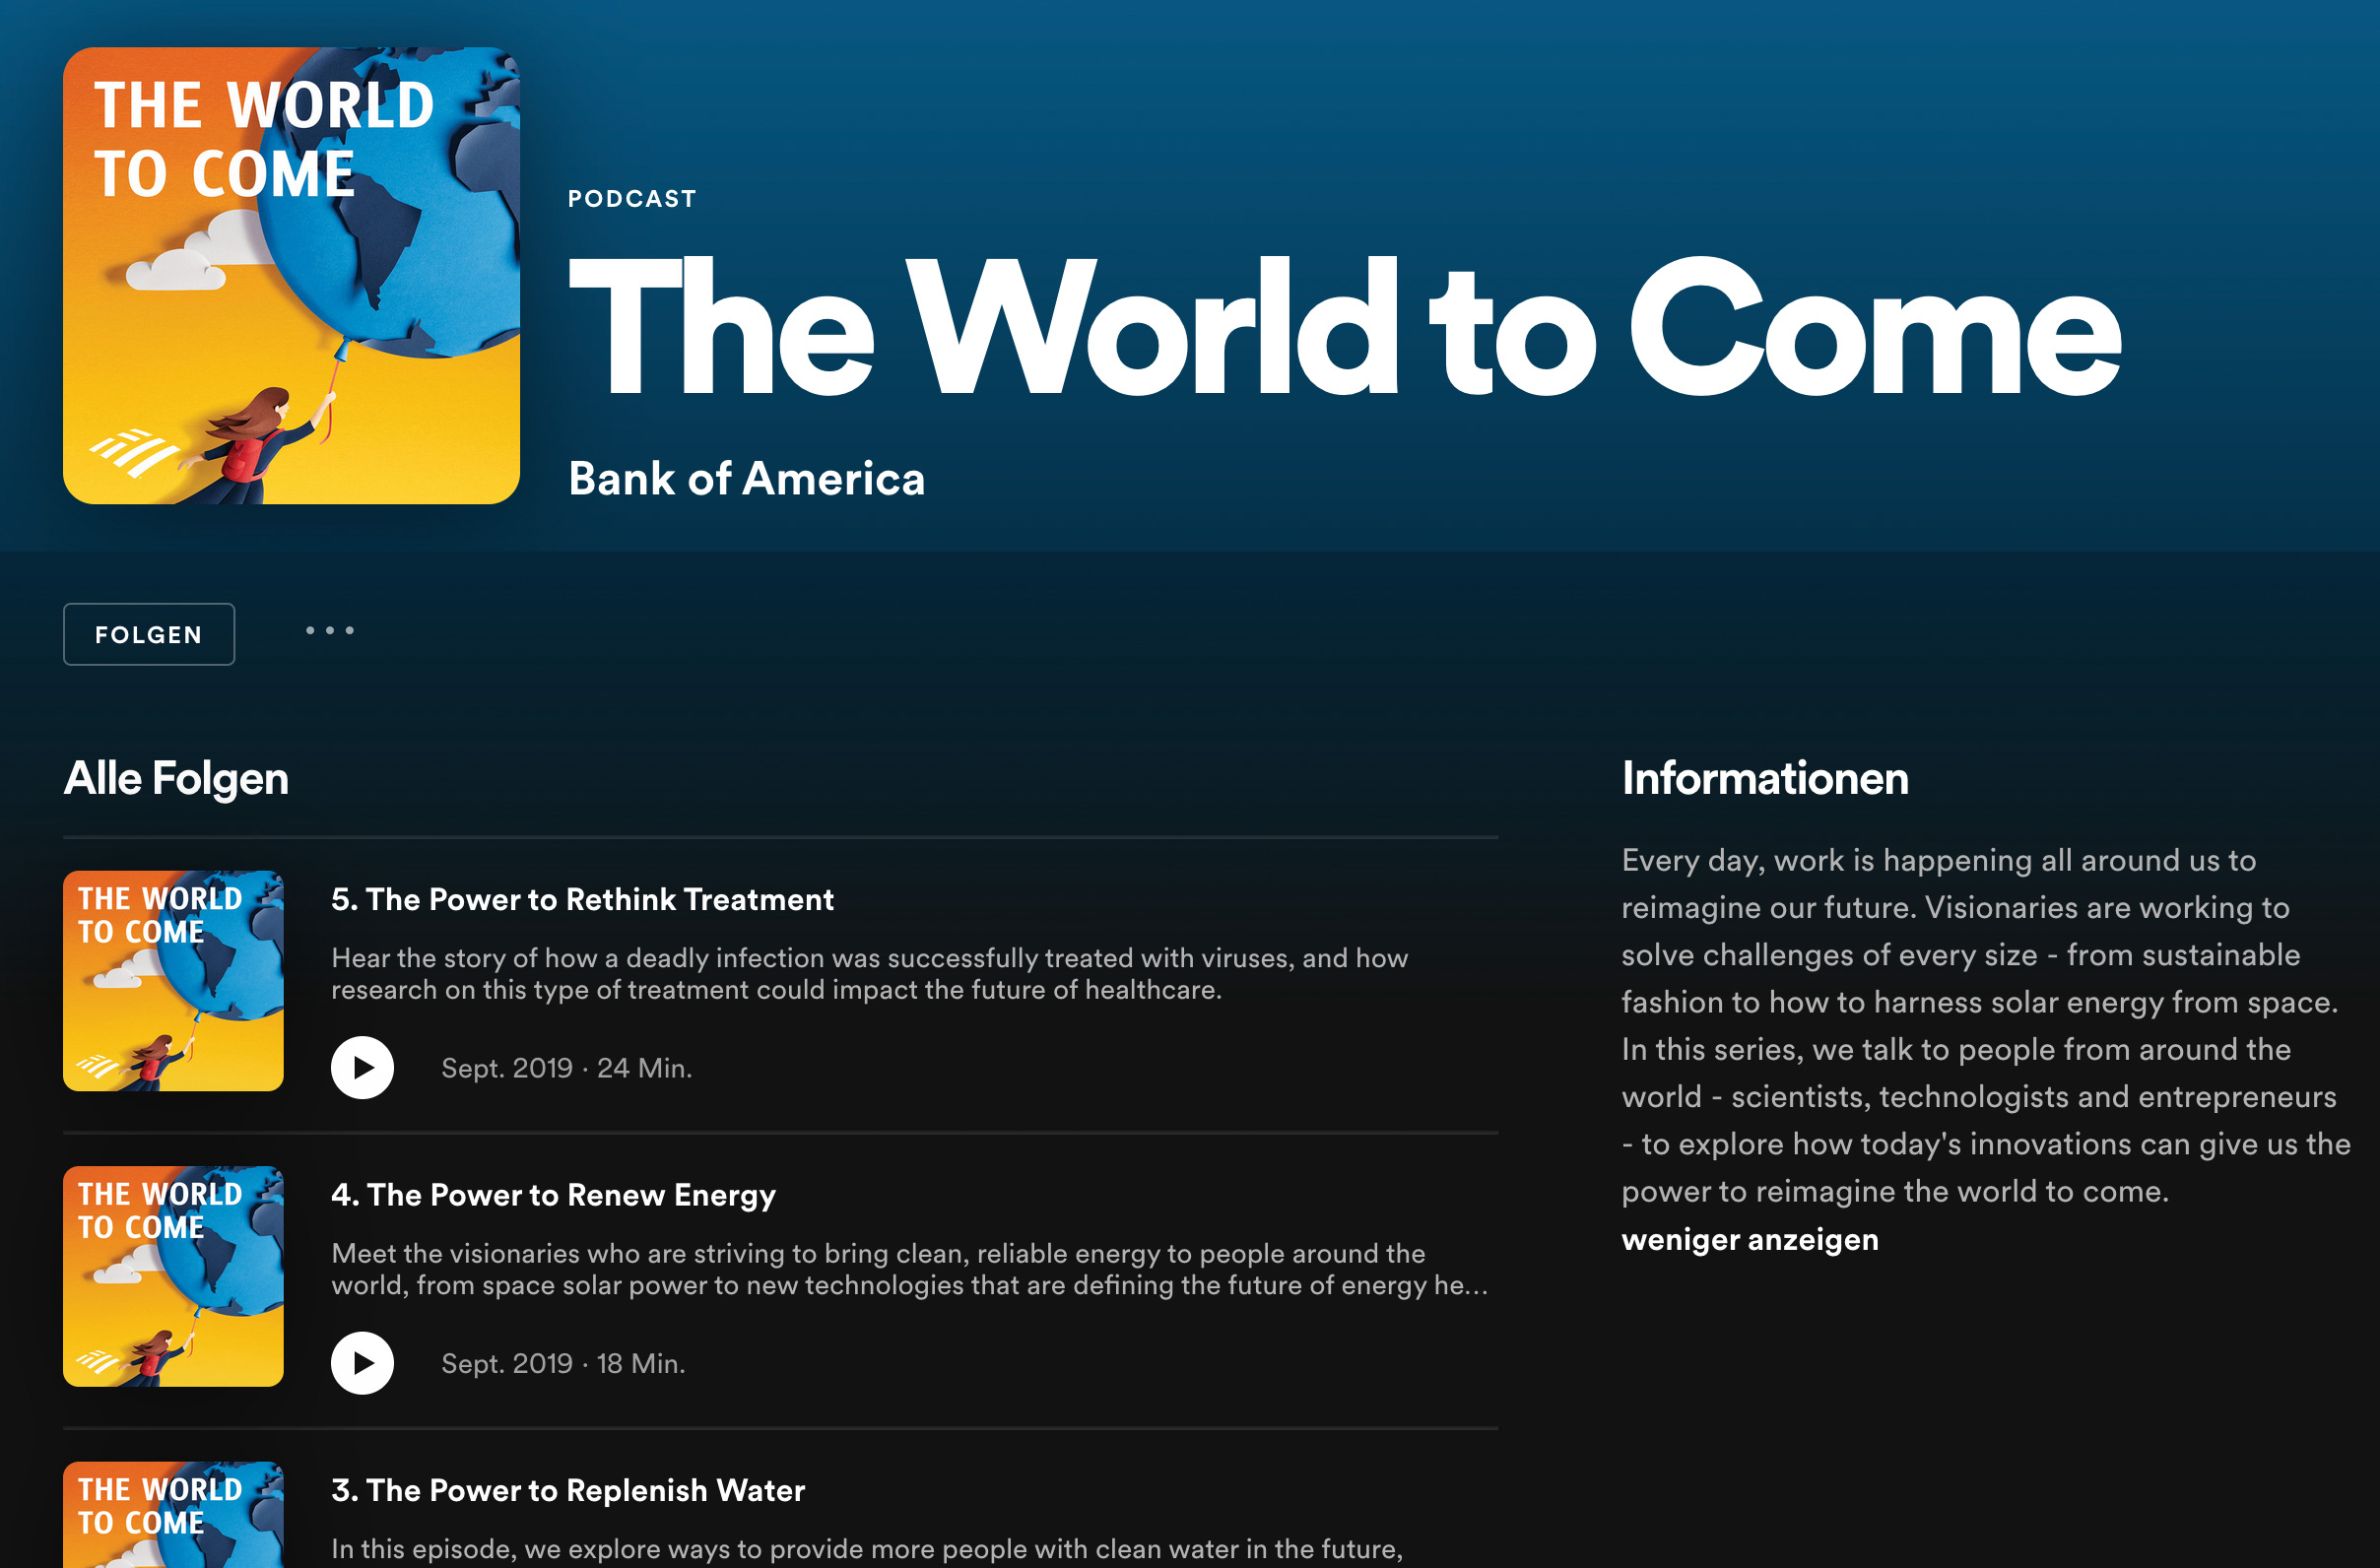 BankofAmerica_theworldtocome_paperart_KatrinRodegast_web3